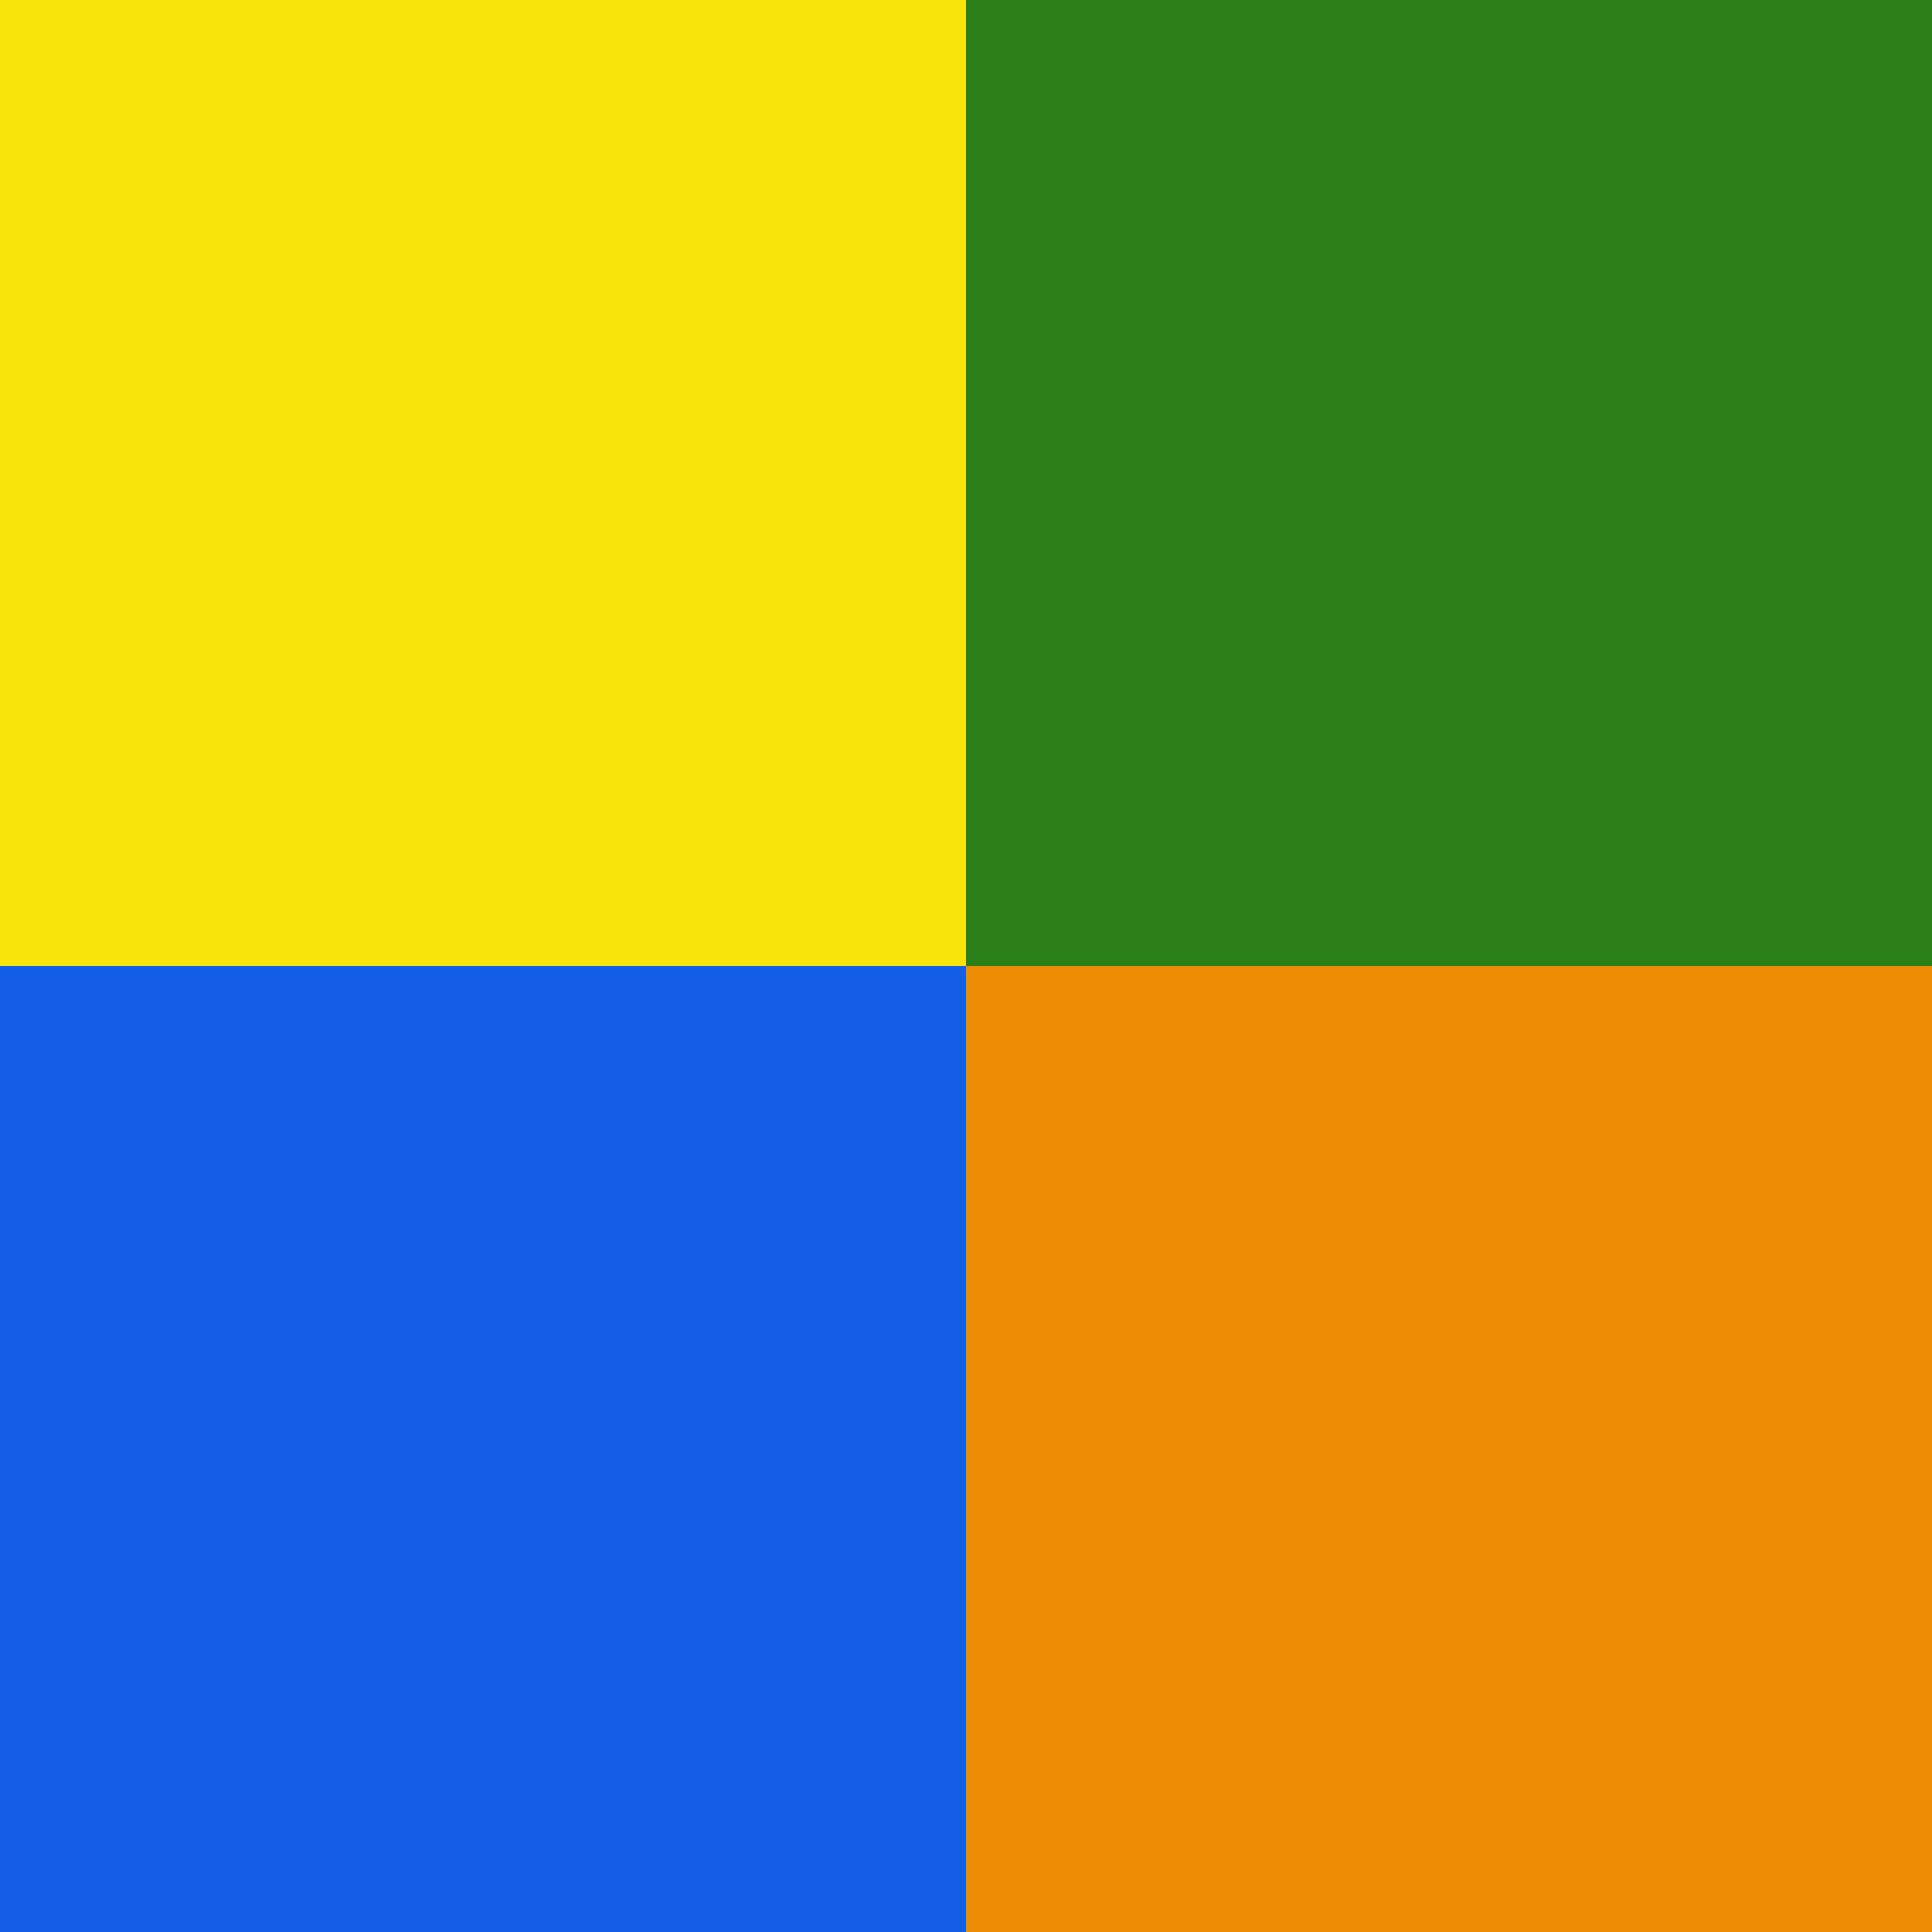 color pallete.jpg